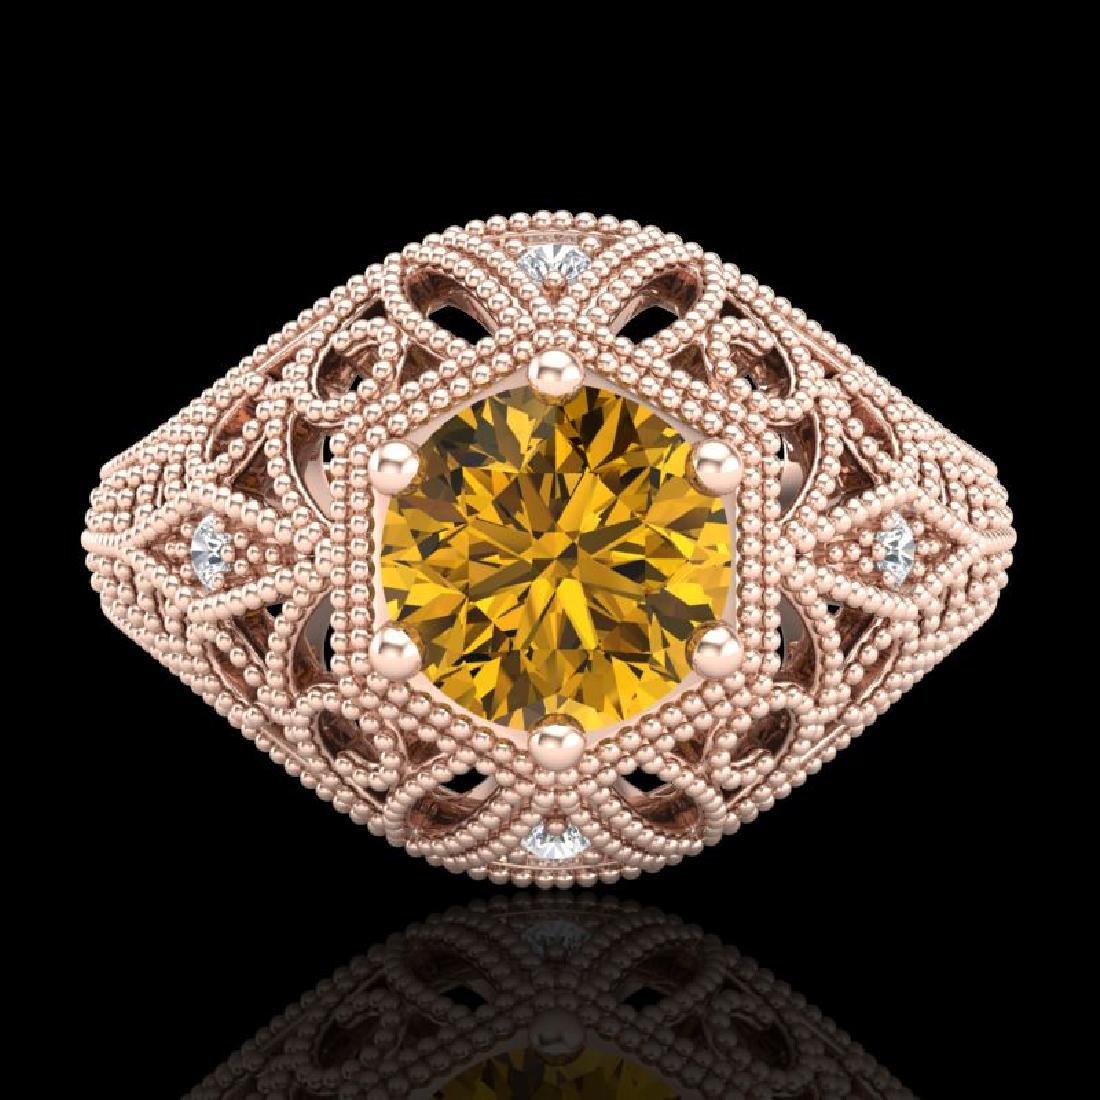 1.07 CTW Intense Fancy Yellow Diamond Engagement Art - 2